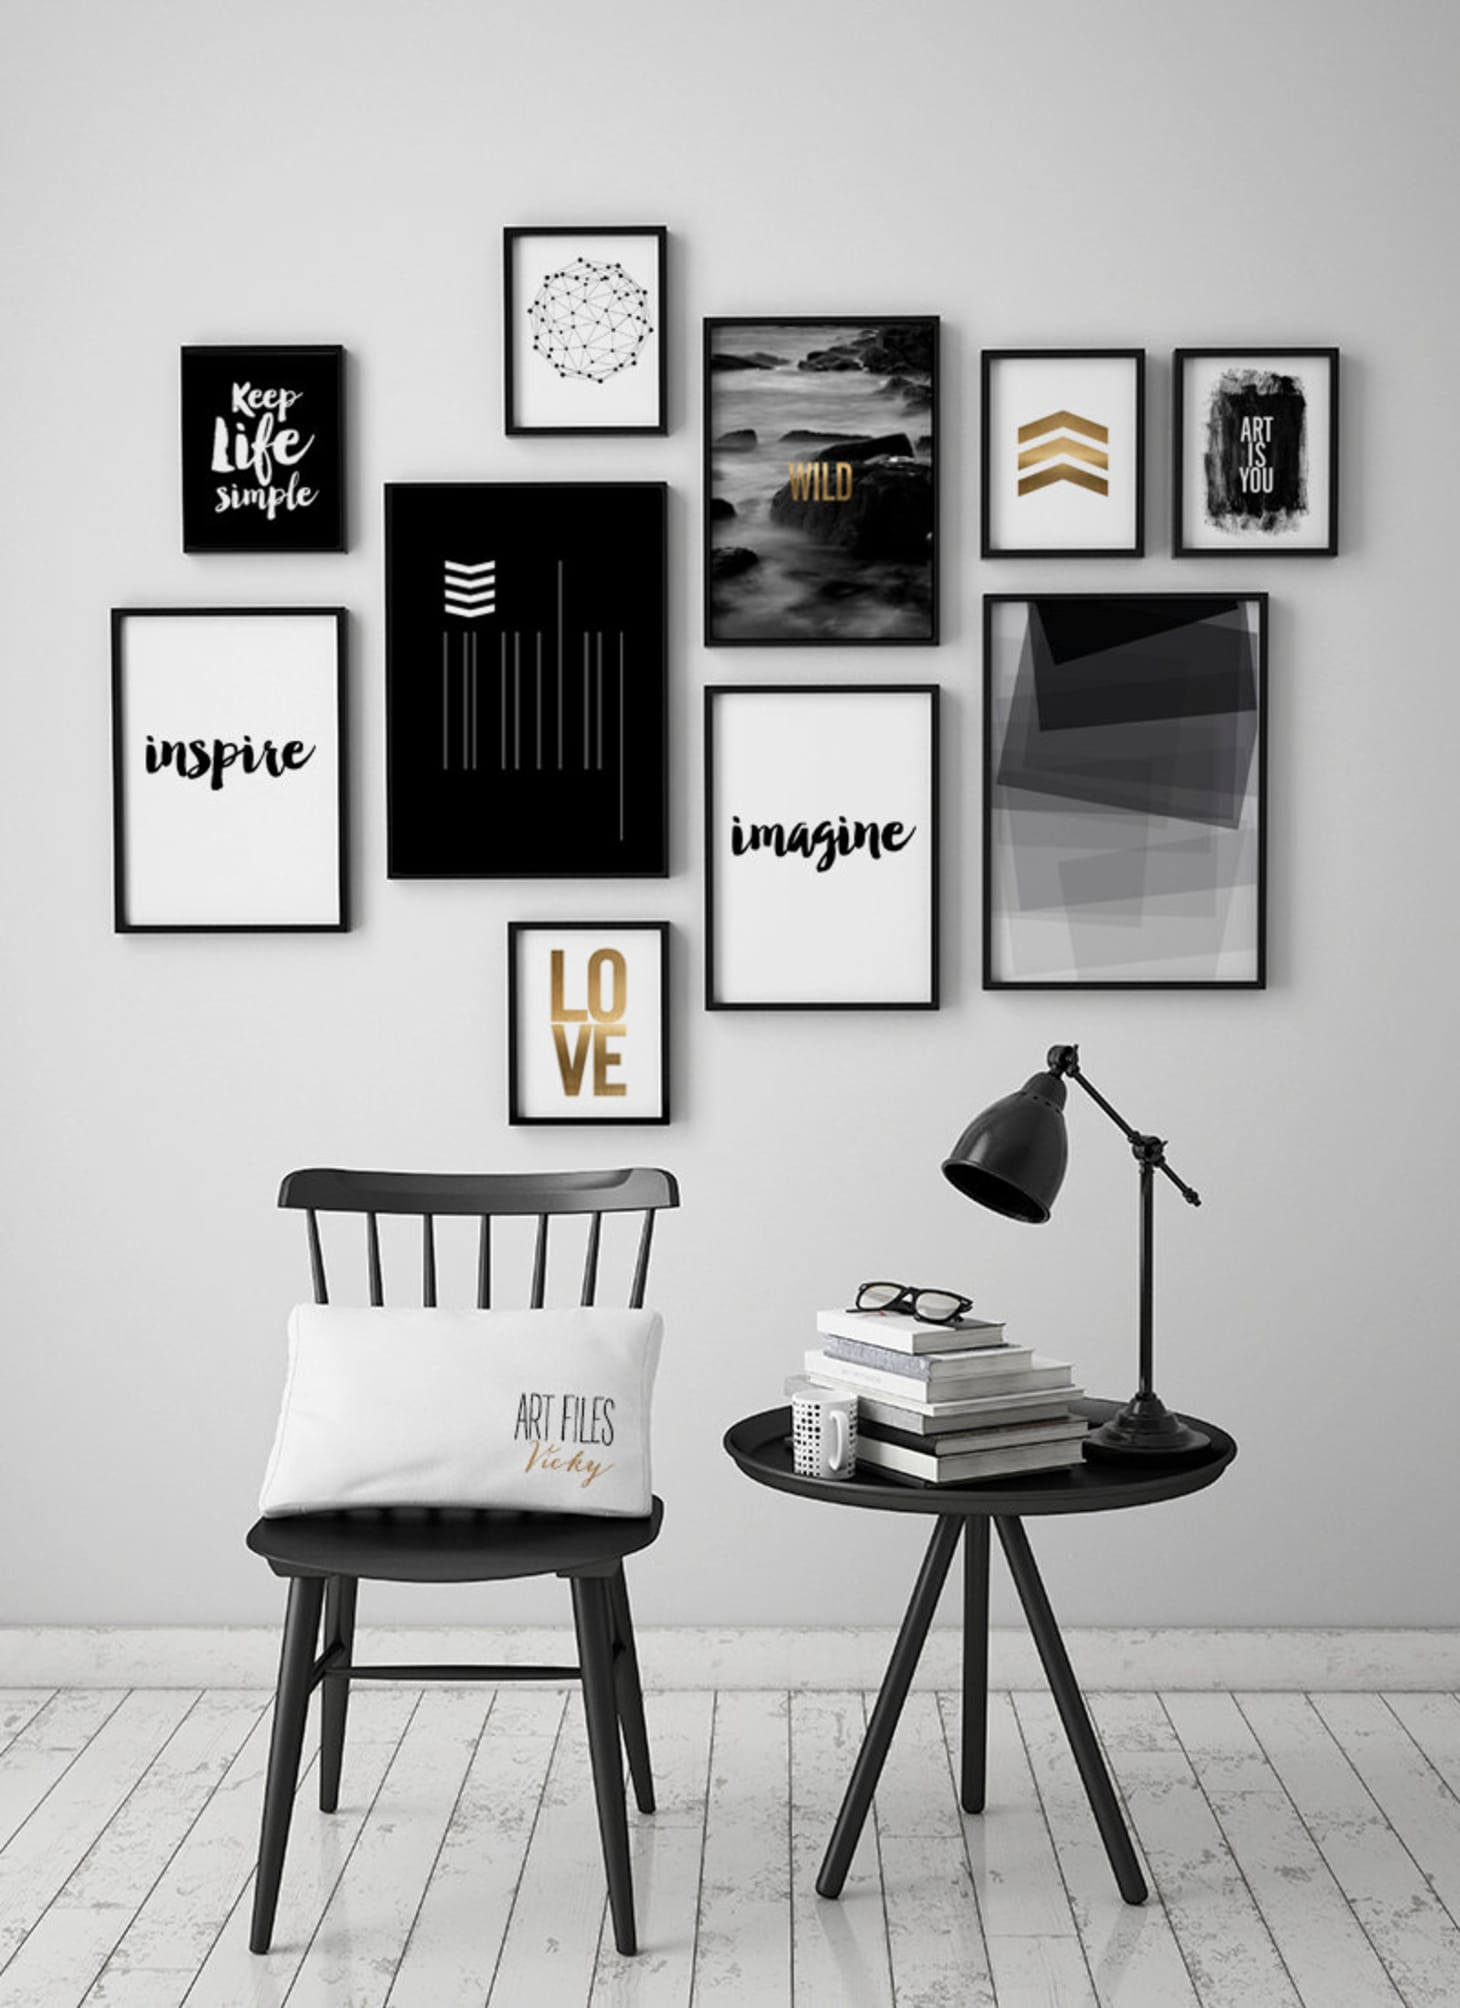 Pleasant Black And White Design Ideas Black And White Decor Short Links Chair Design For Home Short Linksinfo